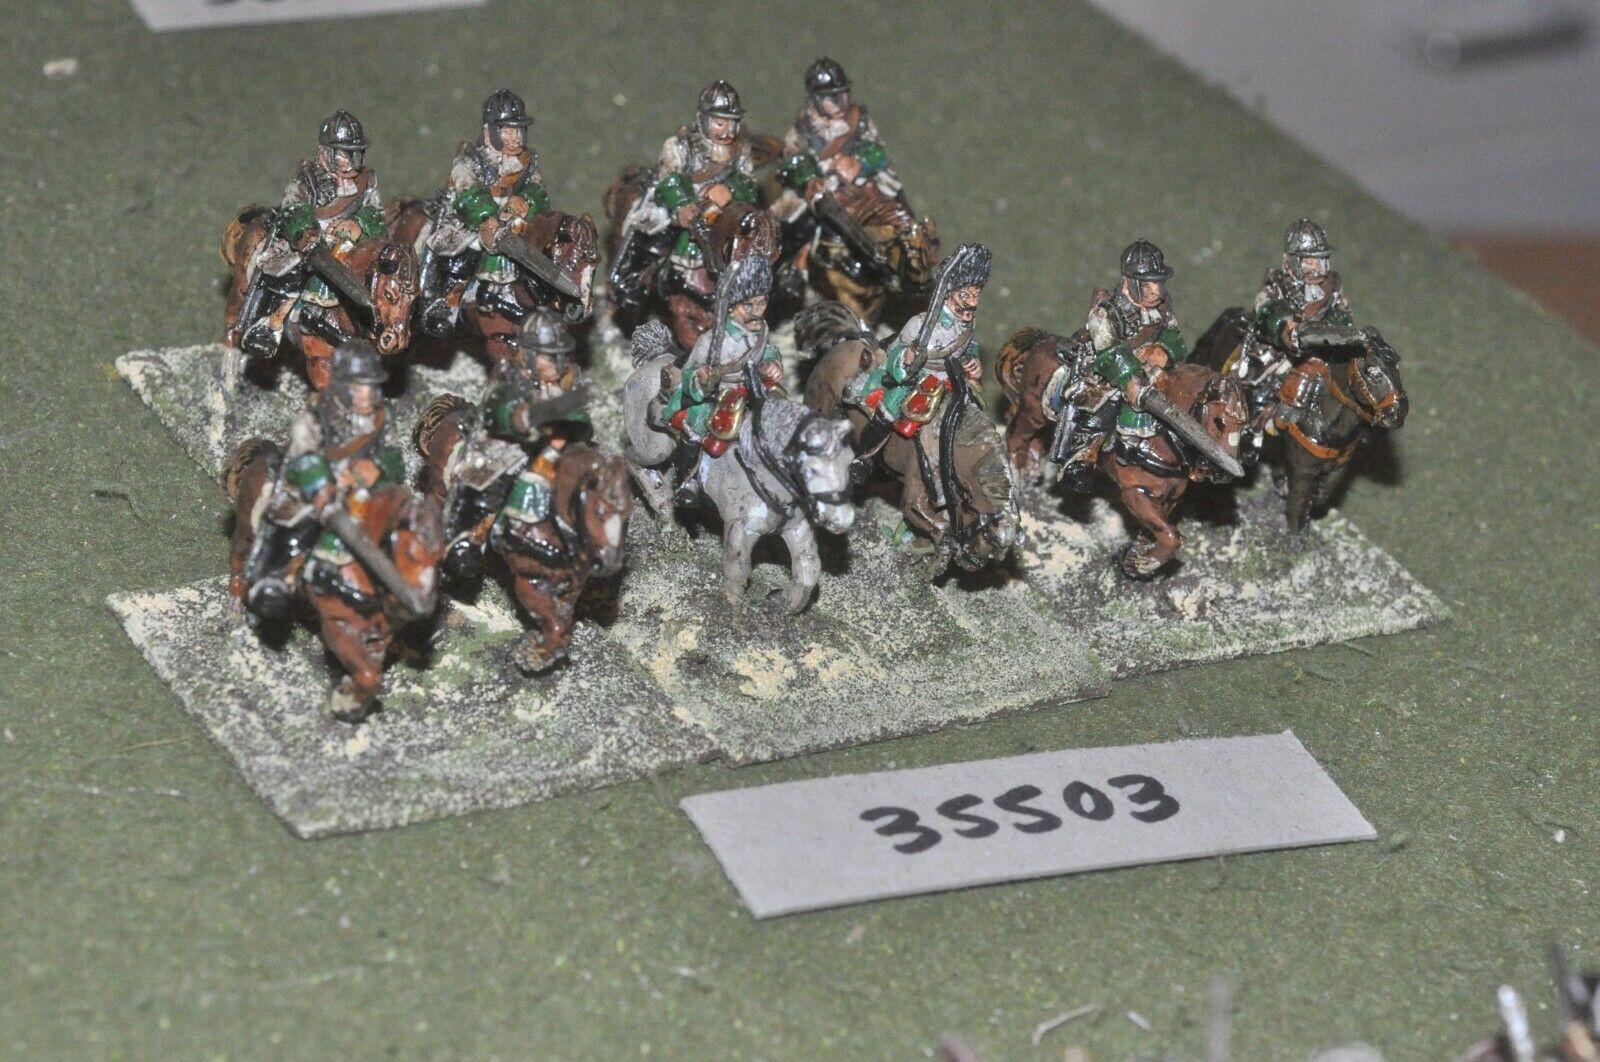 25mm marlburian   austrian - cuirassiers 10 figures - cav (35503)